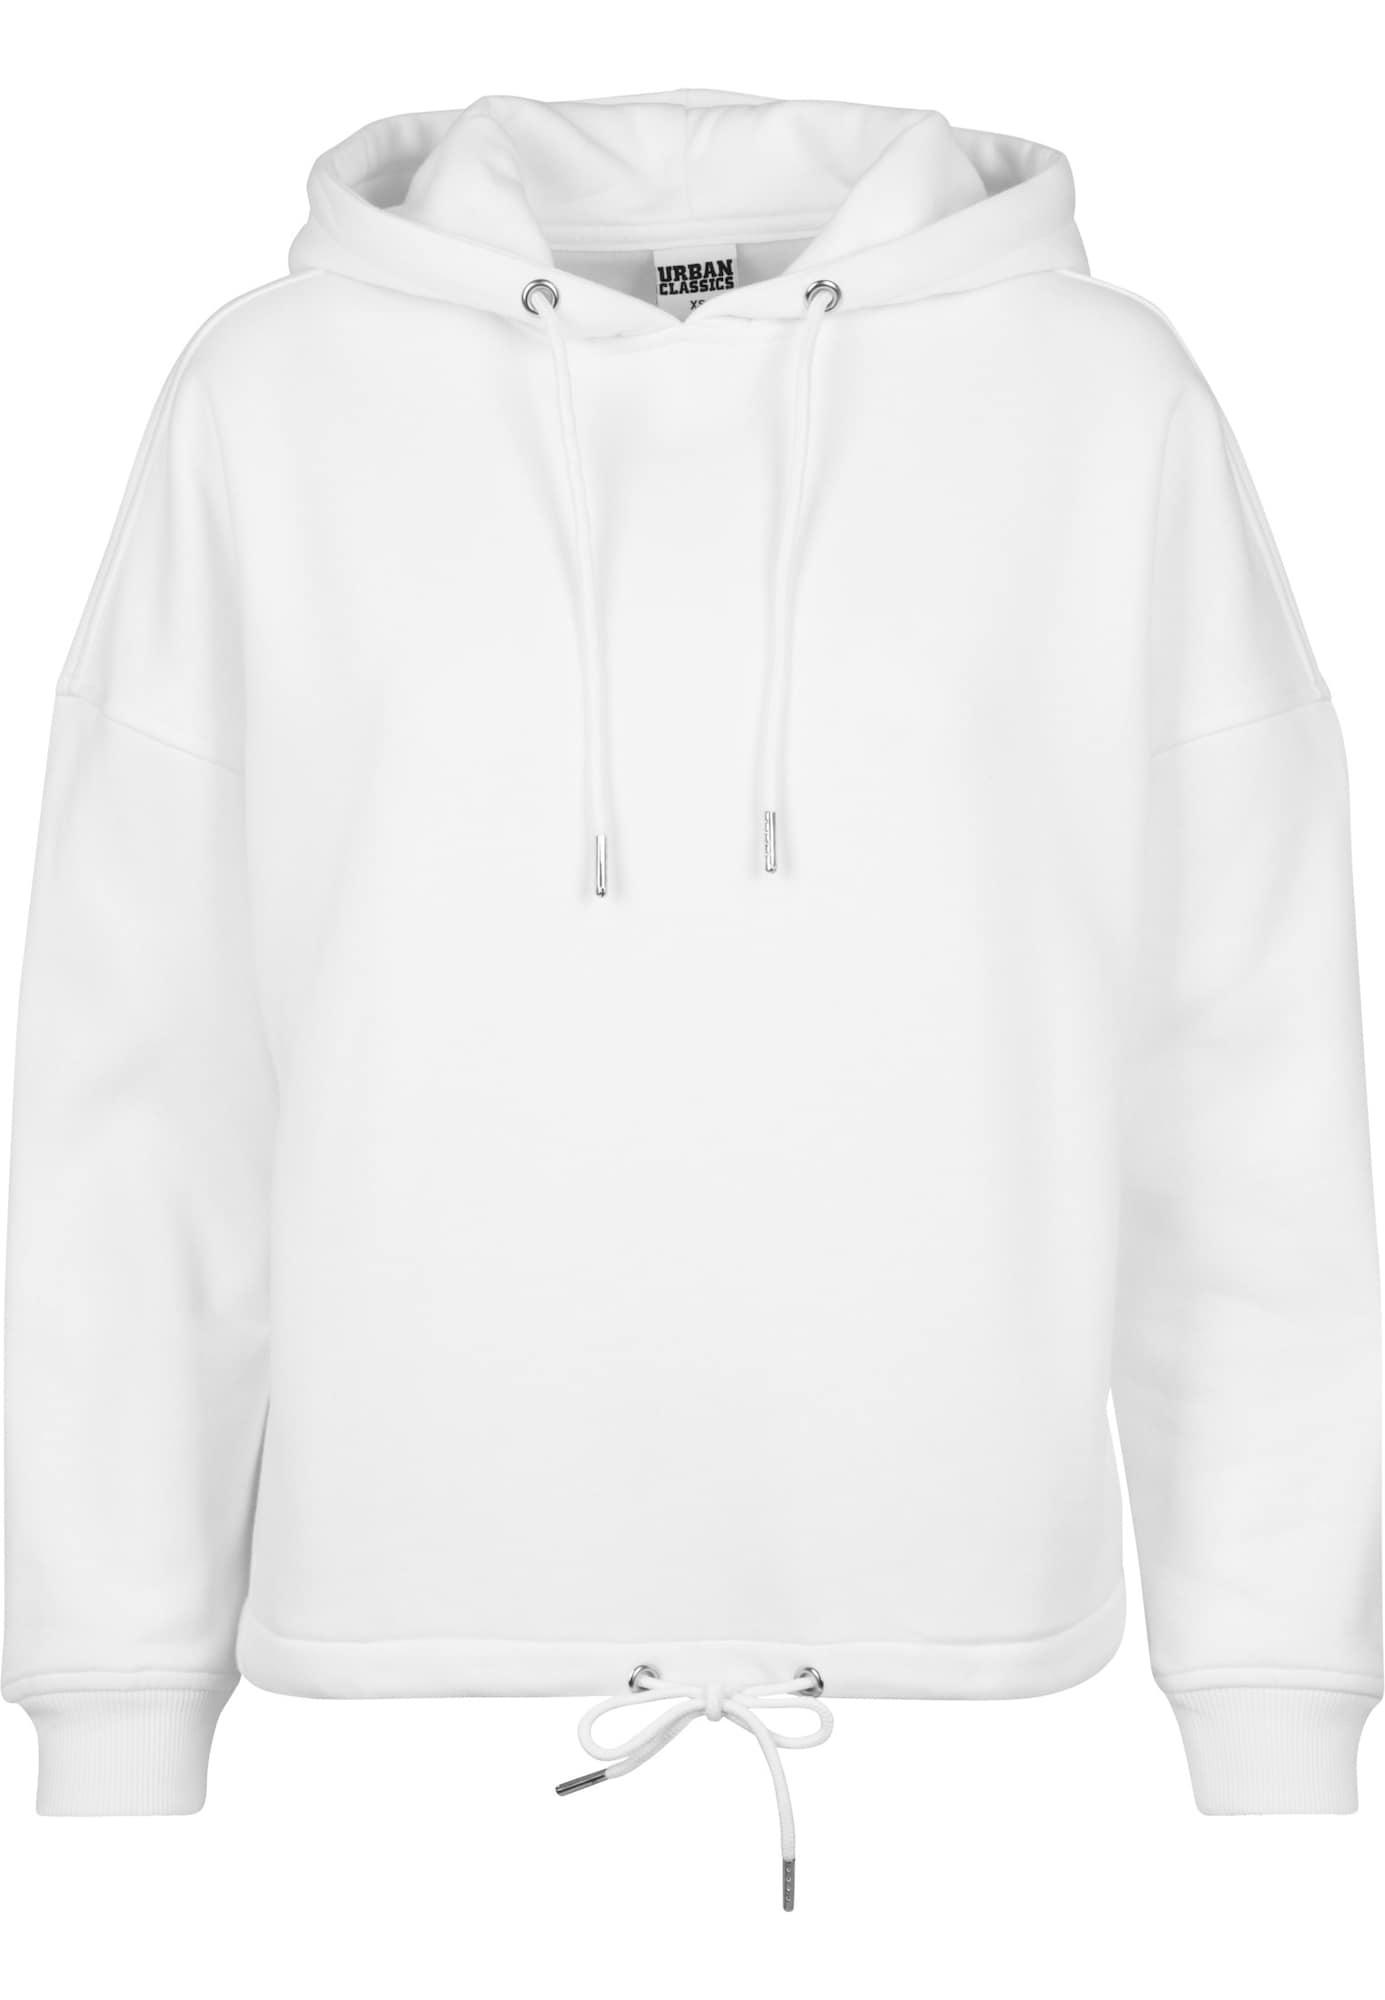 Kimono Hoody | Bekleidung > Homewear > Kimonos | Weiß | Urban Classics